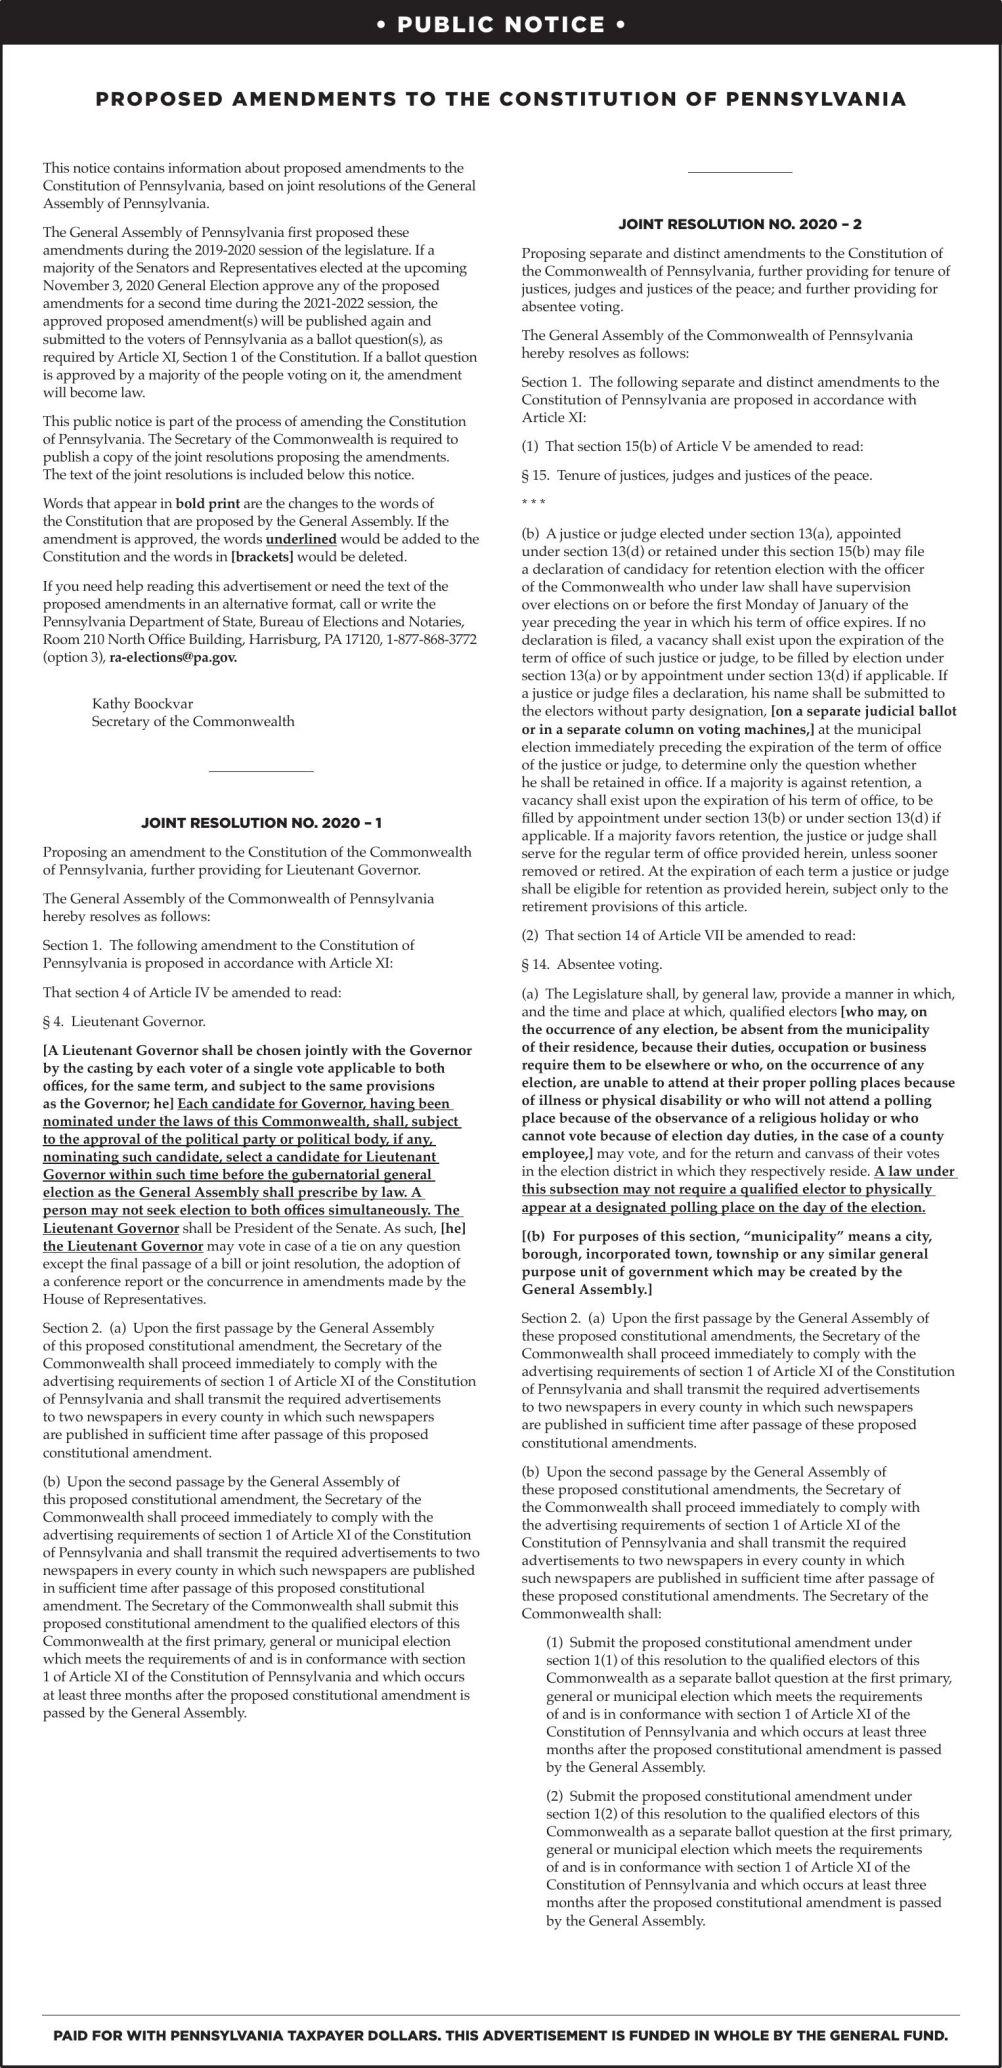 Mansi Const. Am. #1-- #26804 PLE; #26836 FP; #27113 GAZ- 7-30-20.pdf